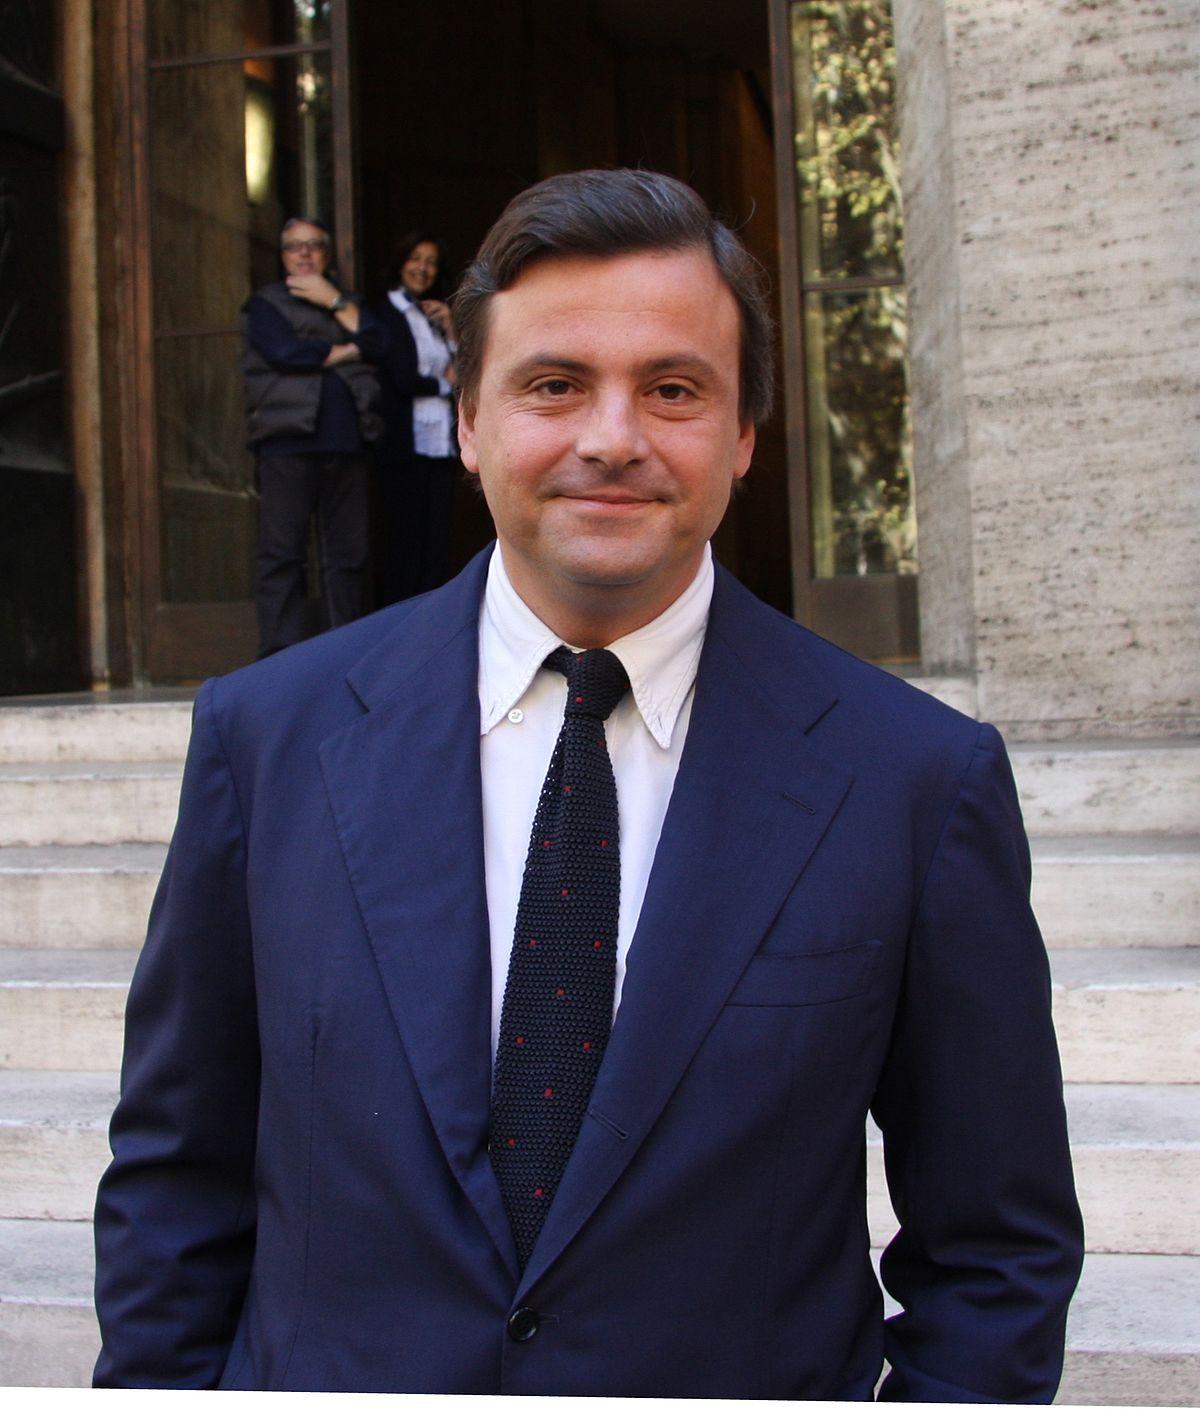 Carlo Calenda - Tlc. Tim: Elliott batte Vivendi e conquista il Cda